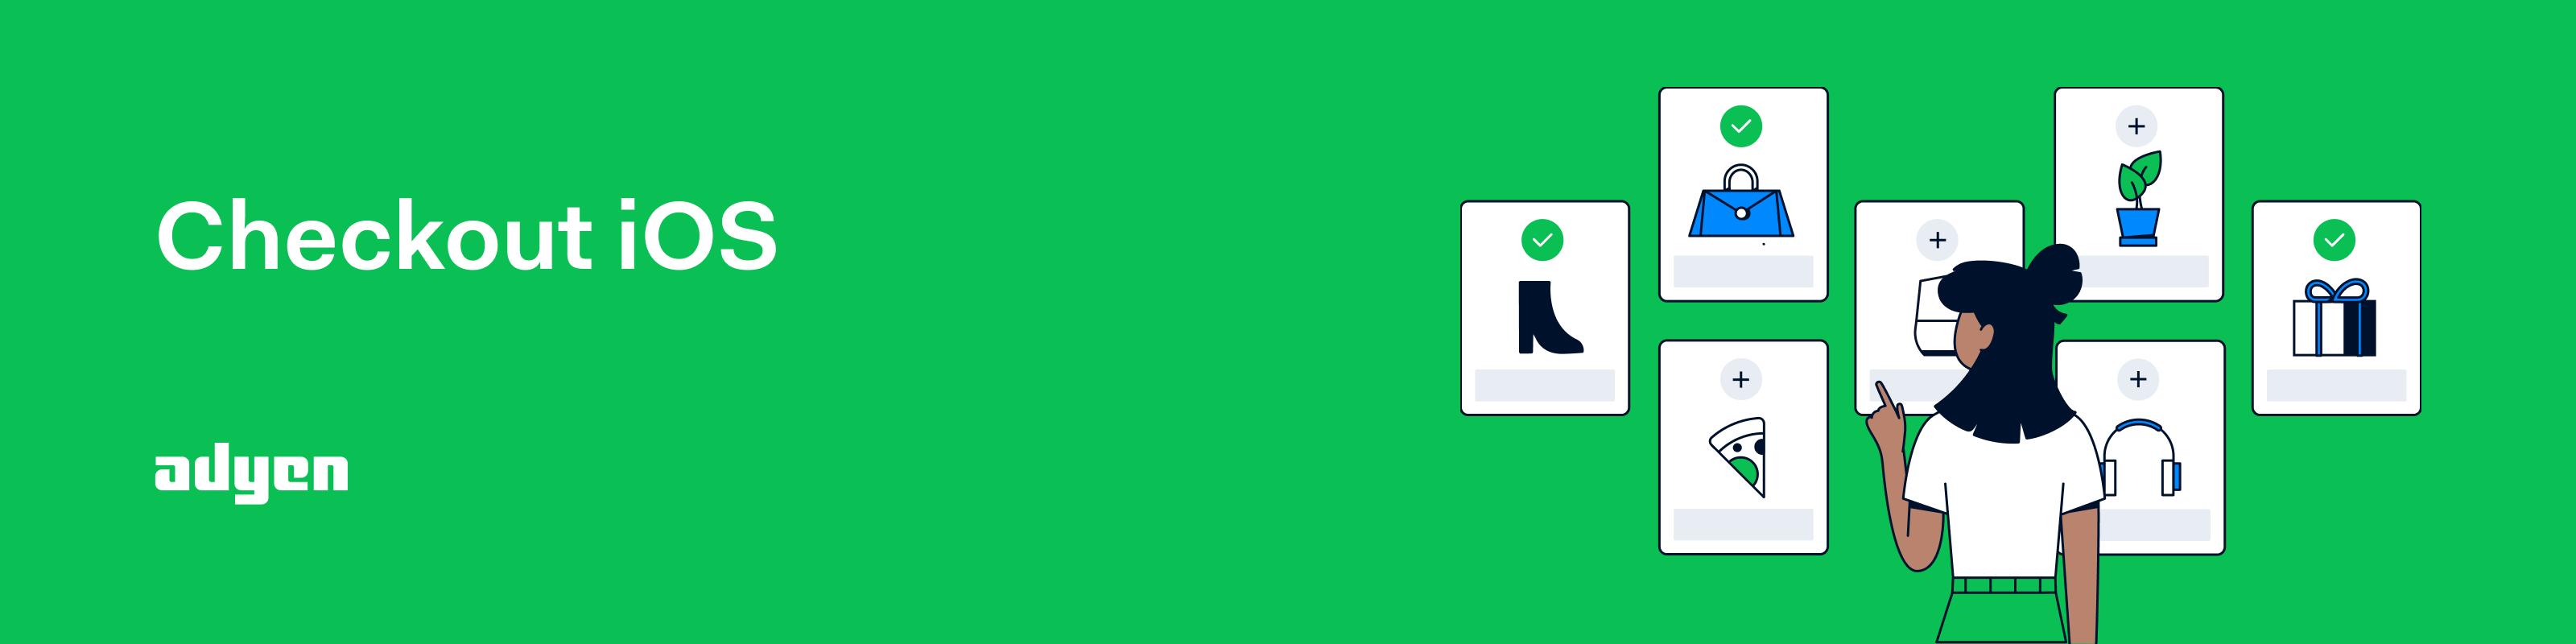 Checkout iOS Logo